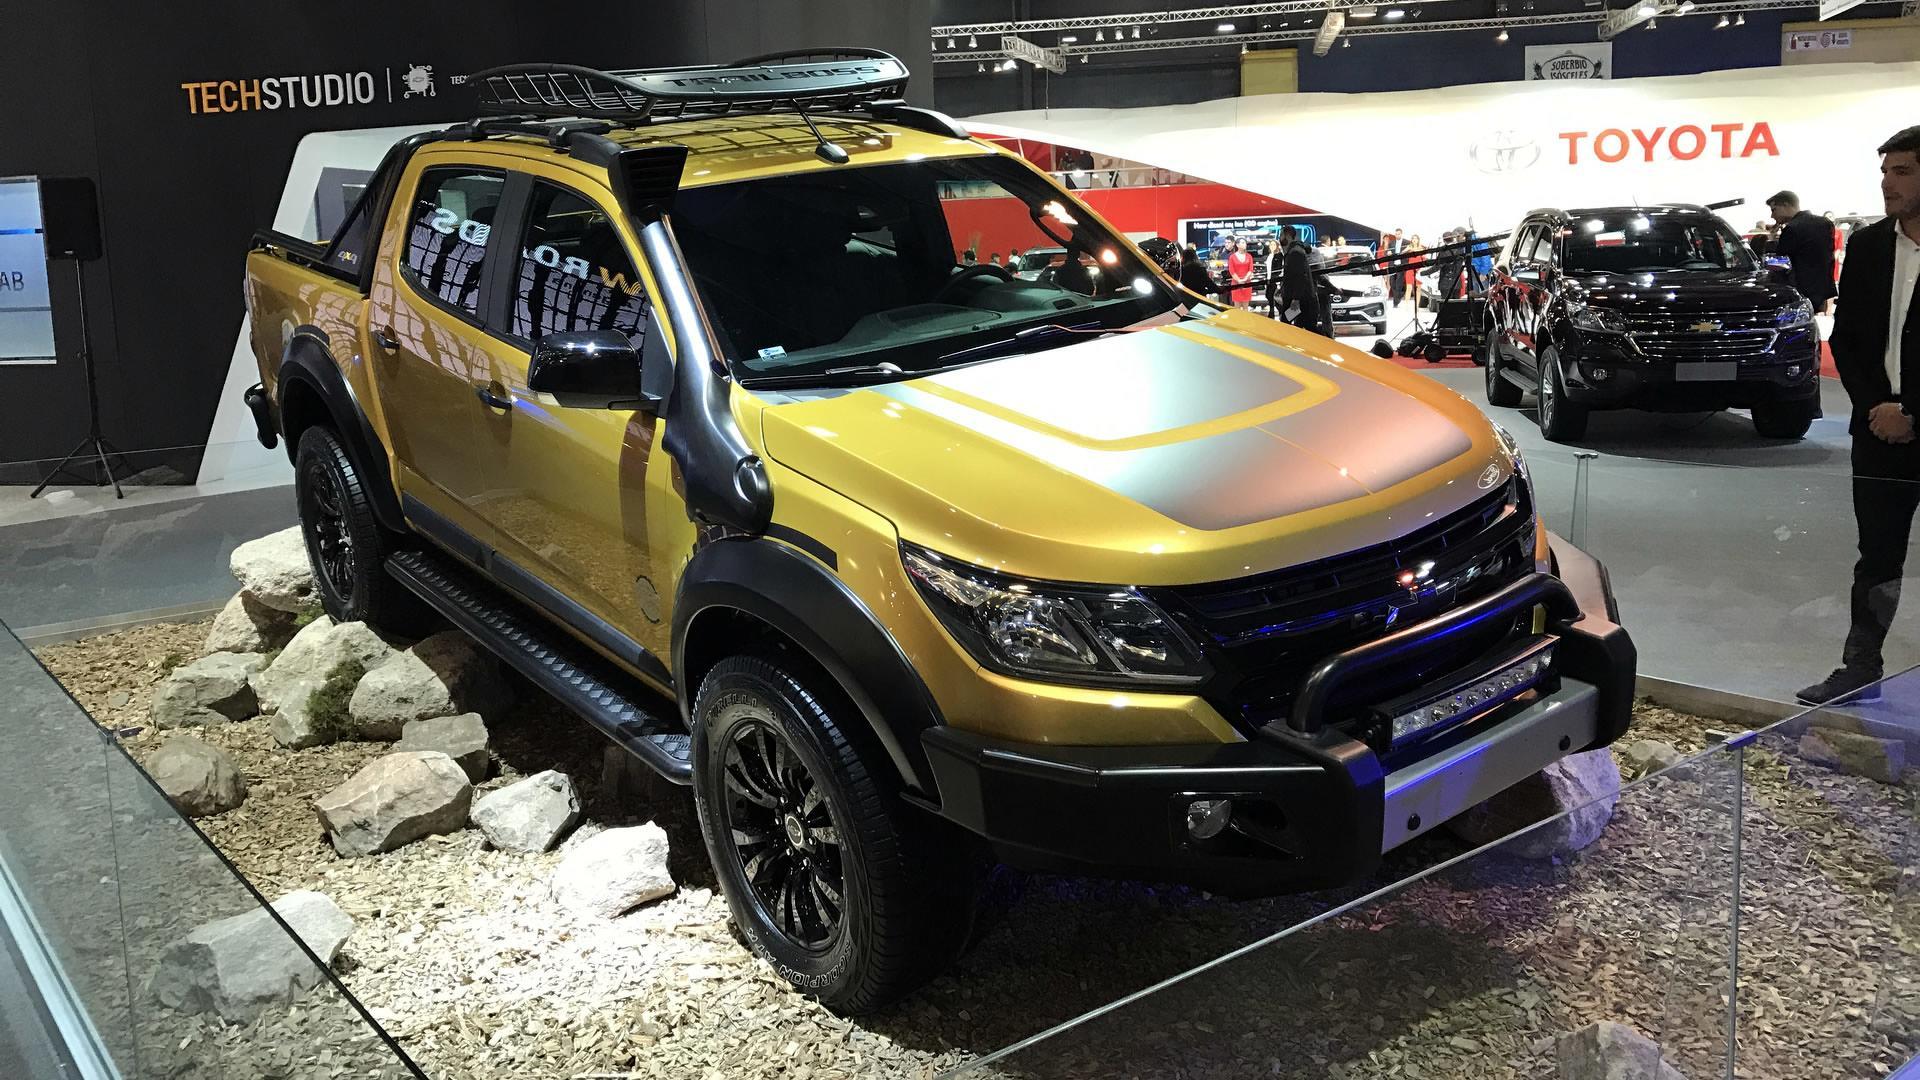 Chevrolet S10 Trailboss Concept Seeks Adventure In Latin America